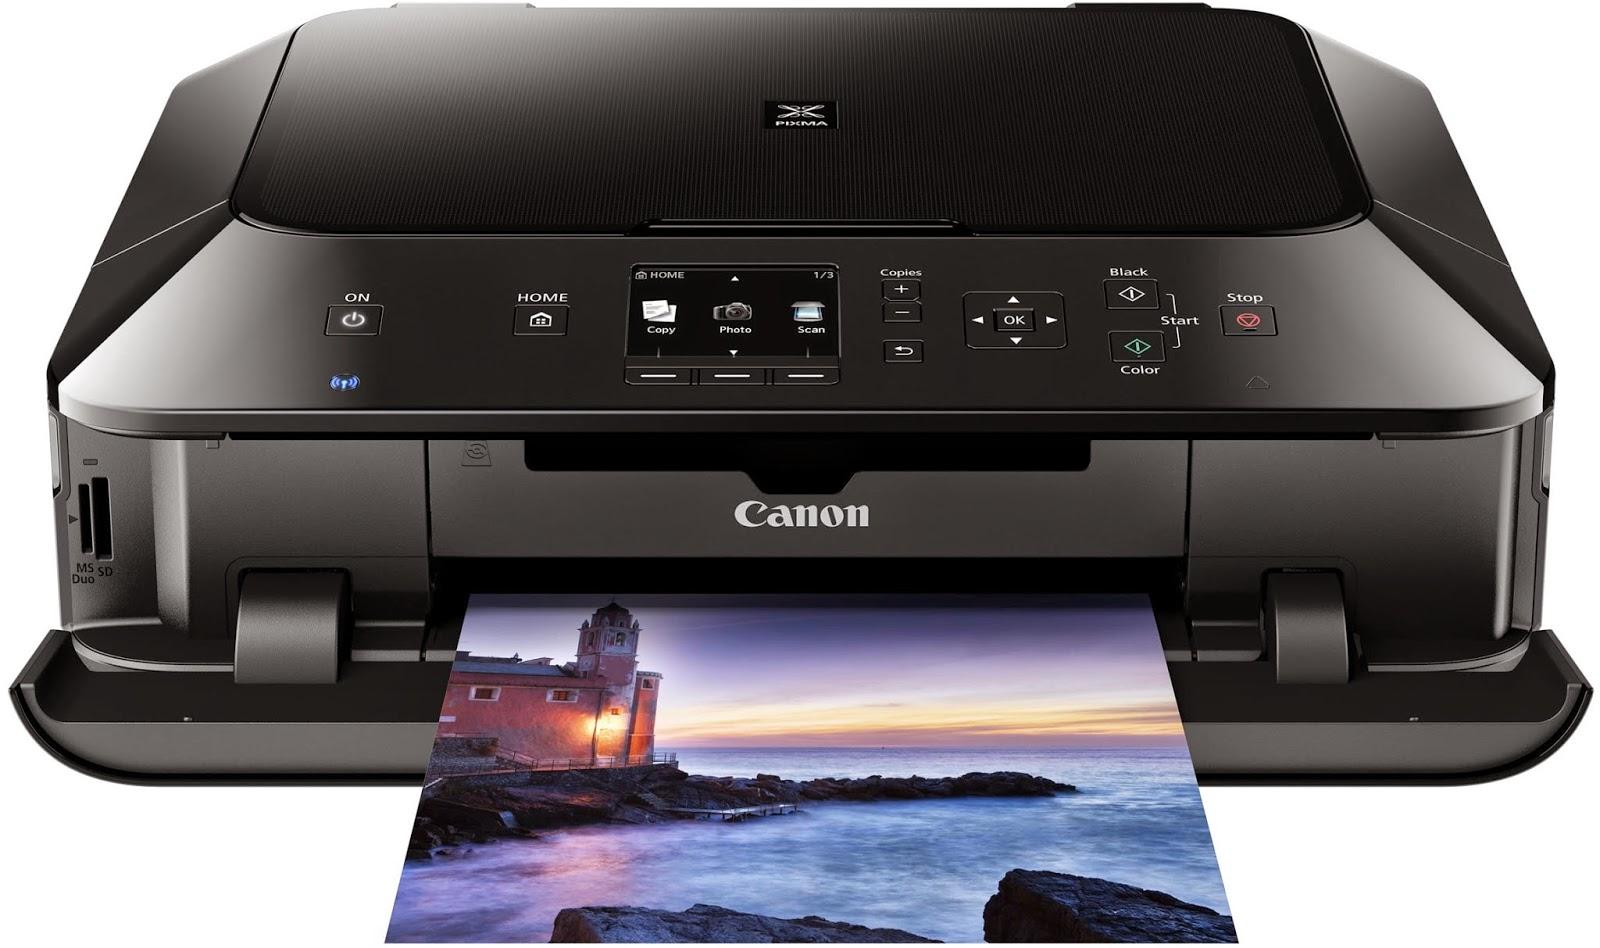 impresora canon error 5,156,61